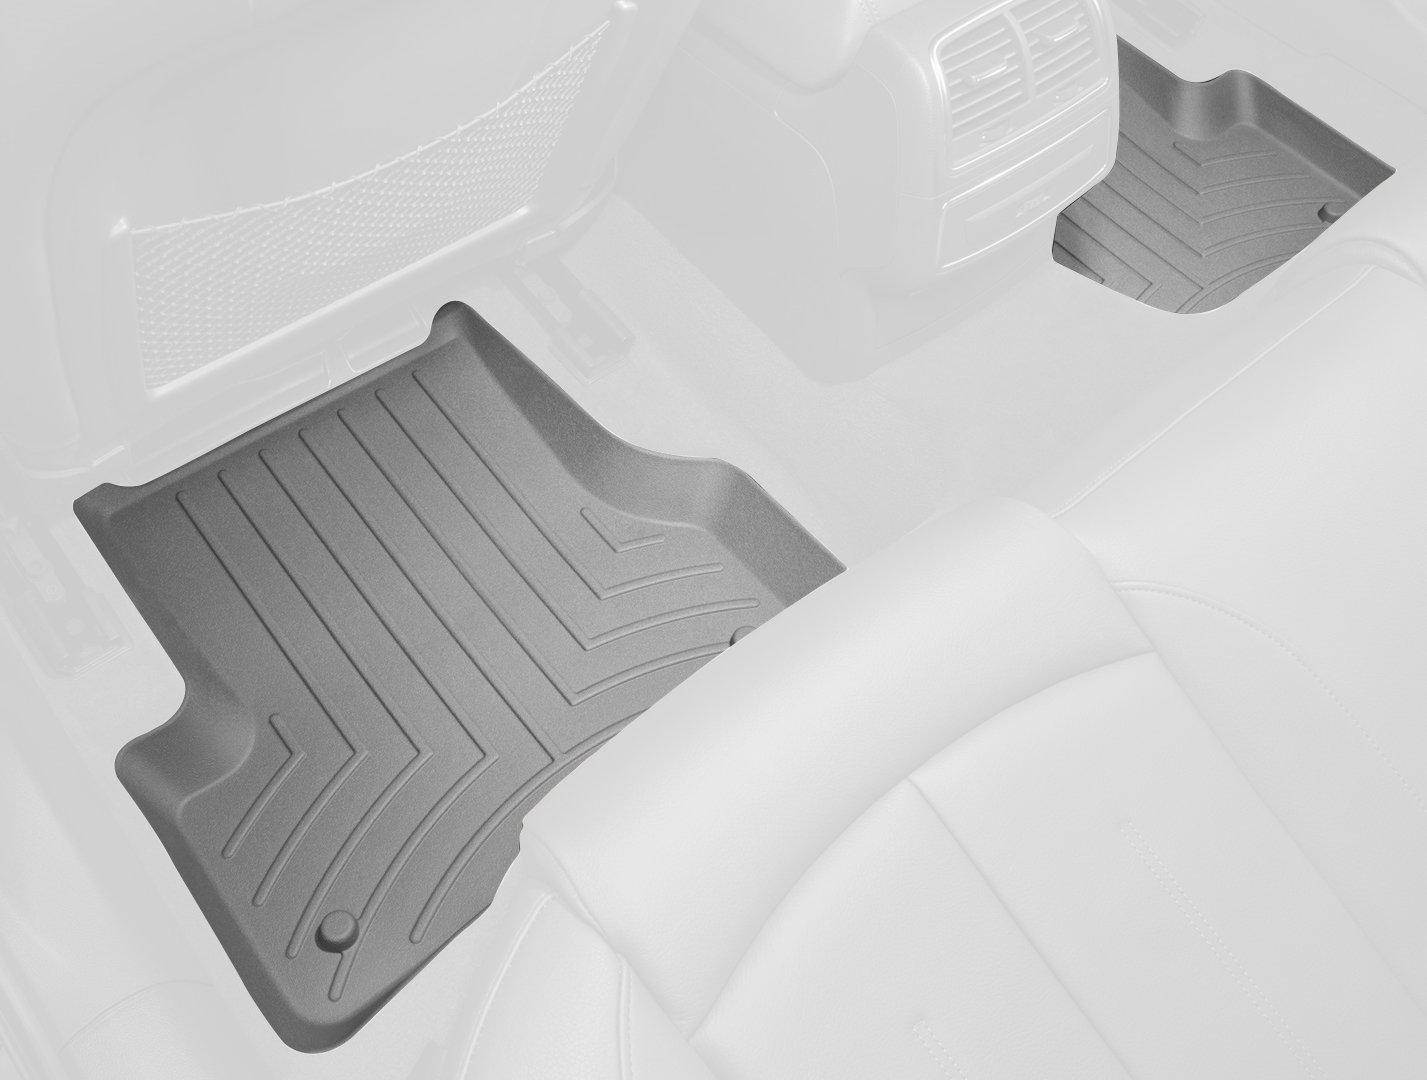 WeatherTech Custom Fit Rear FloorLiner for Chevrolet Avalanche Grey 460663